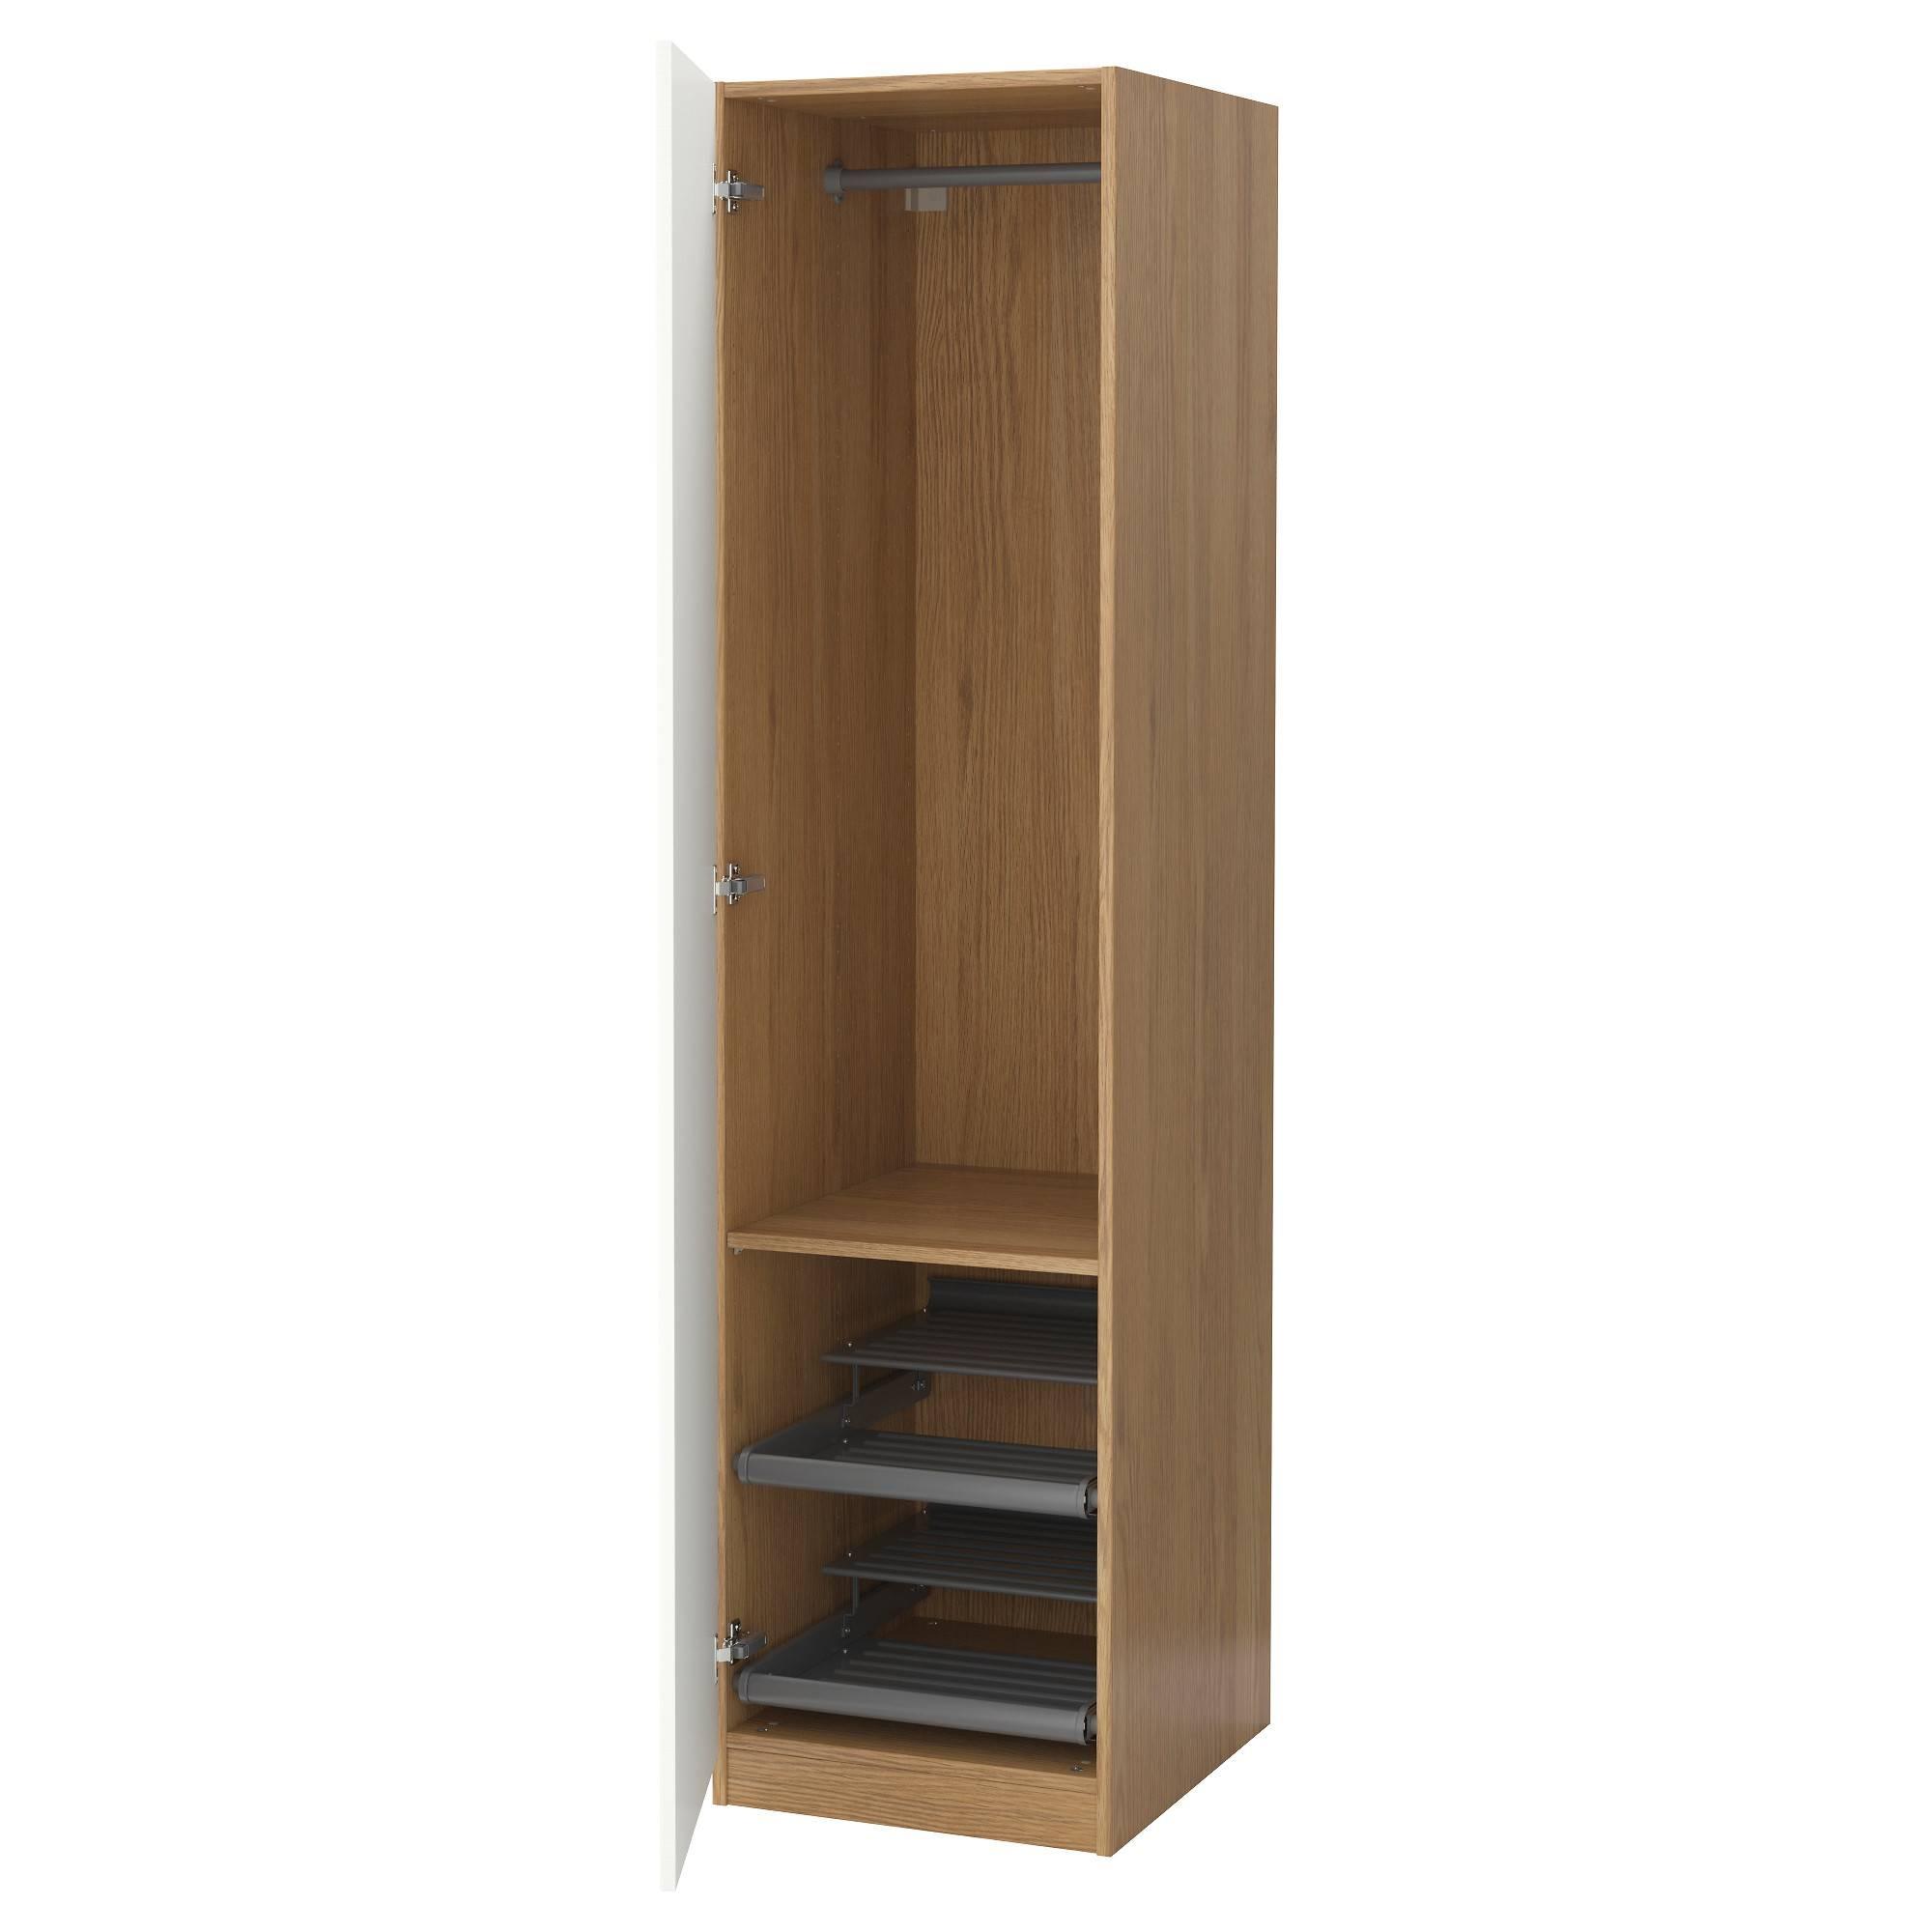 Pax Wardrobe Oak Effect/vinterbro White 50X60X201 Cm - Ikea regarding Single Wardrobes (Image 4 of 15)